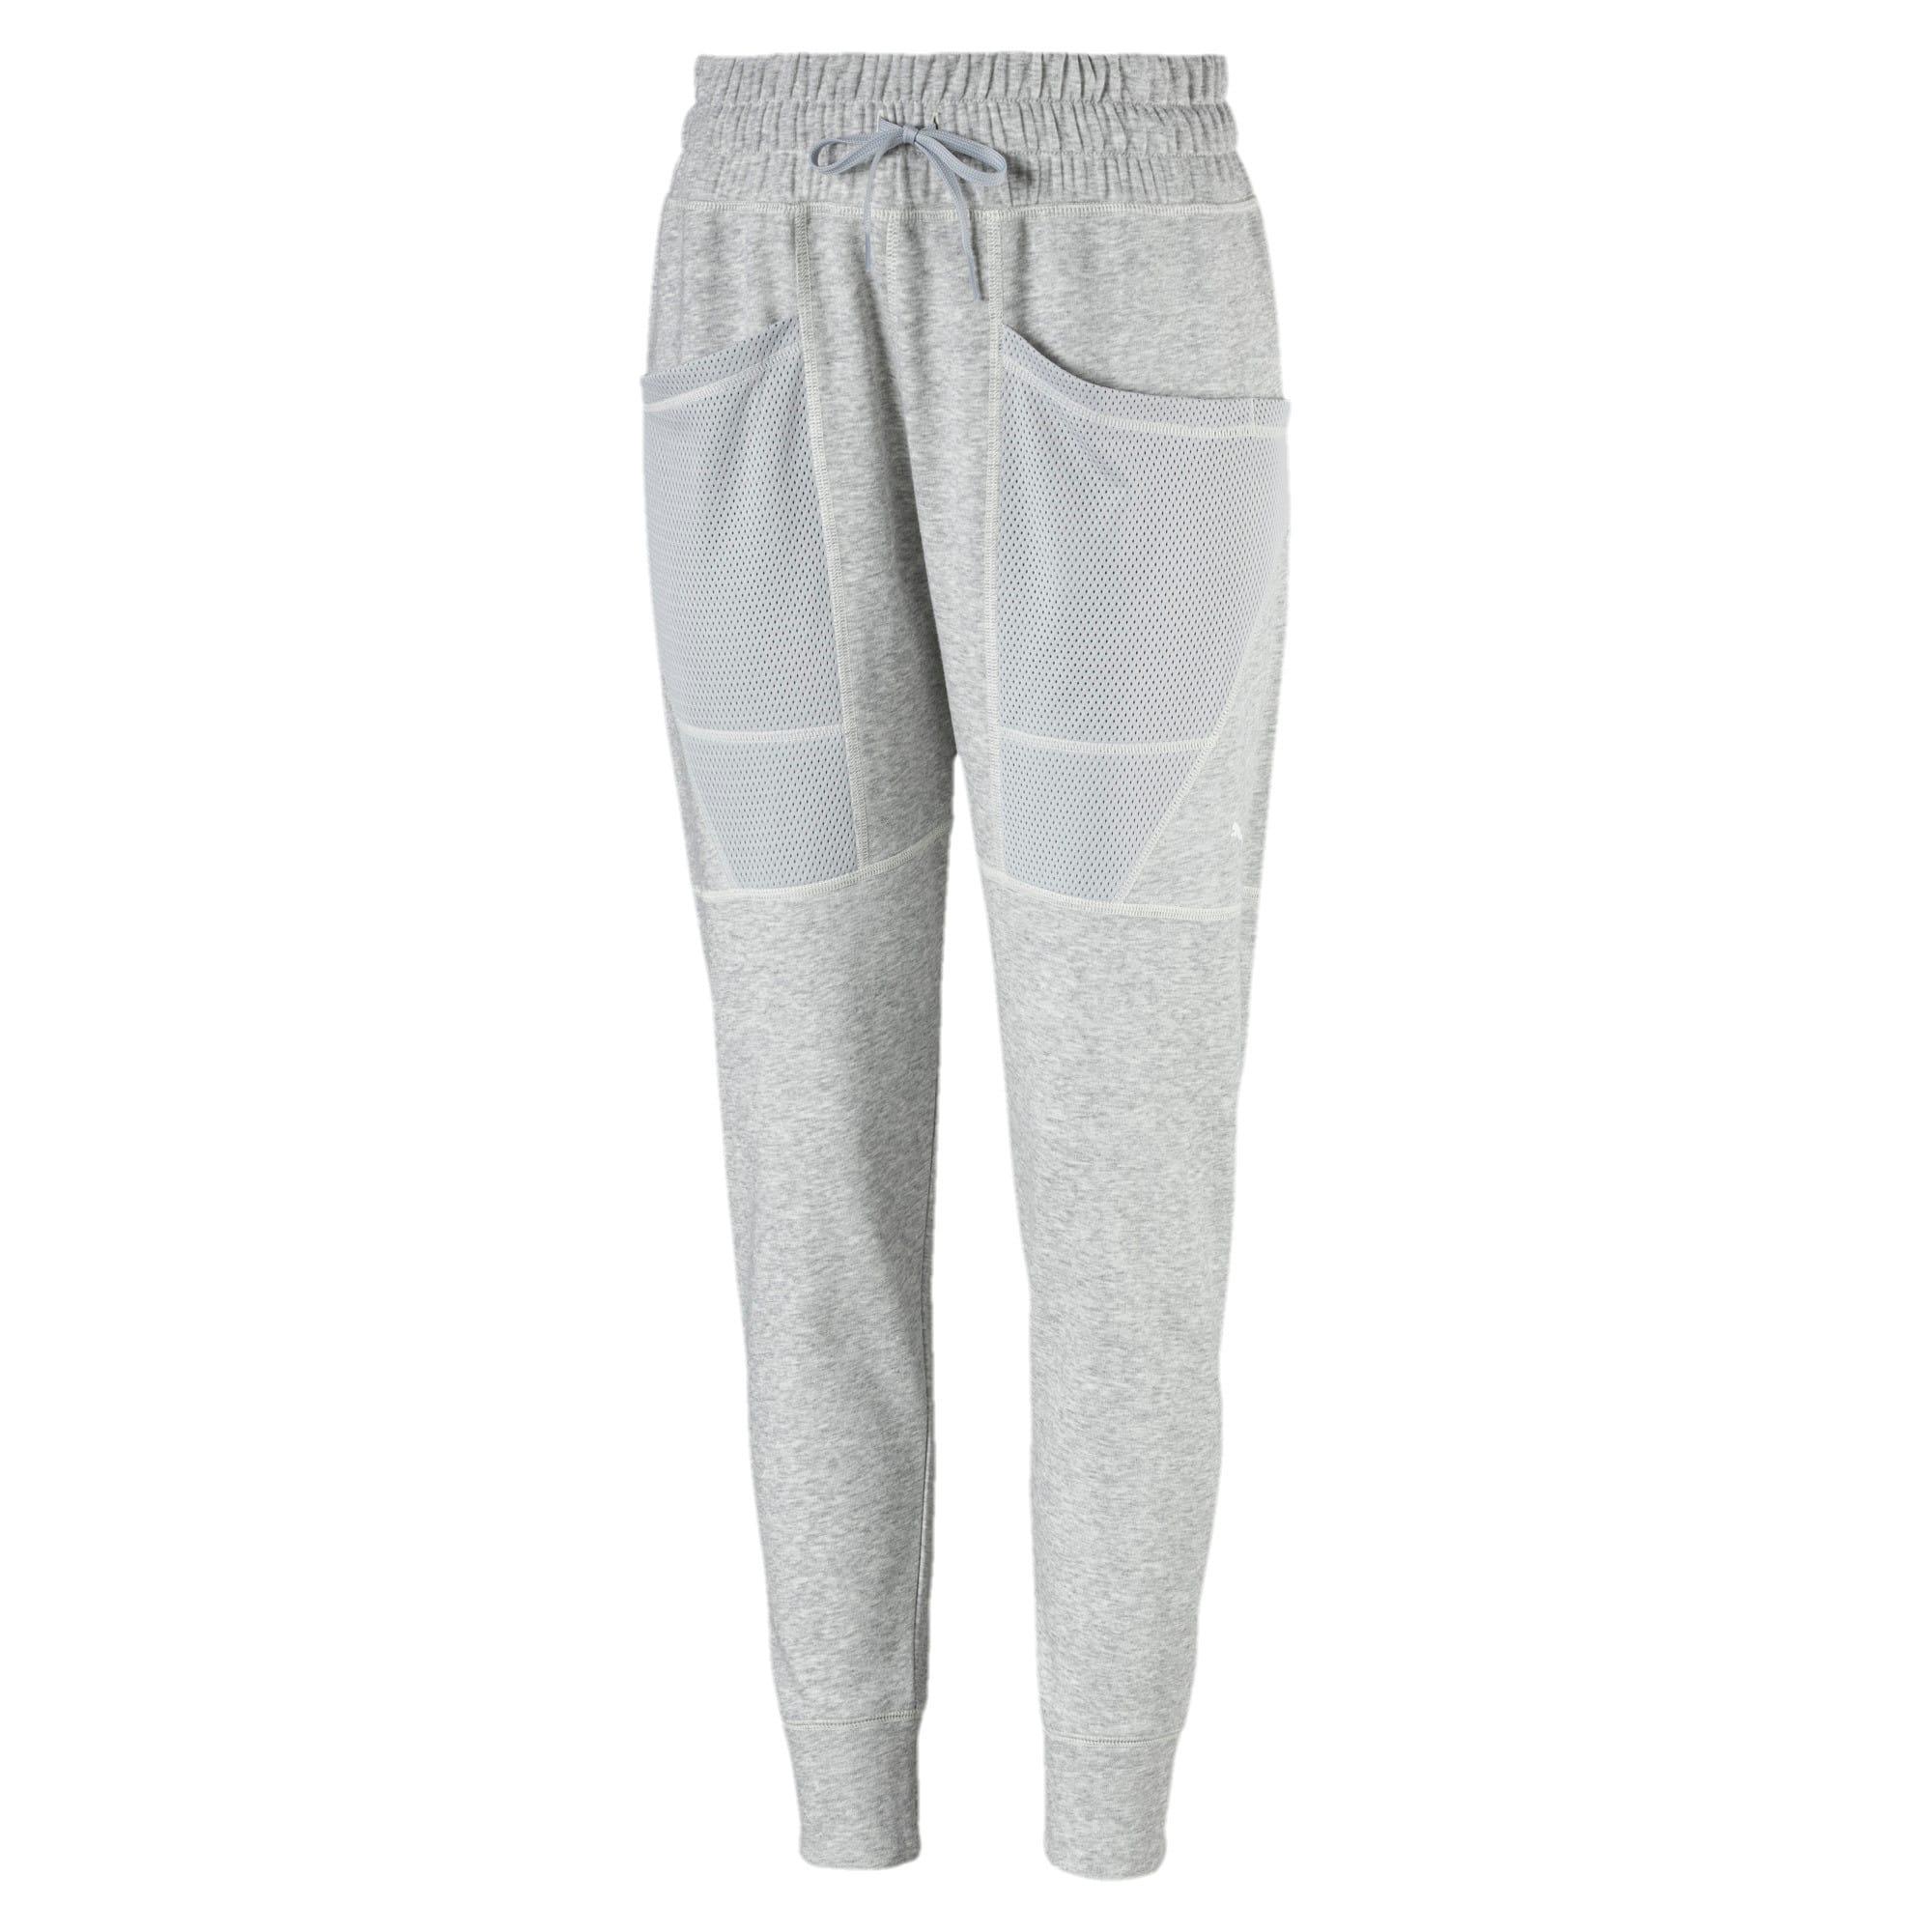 Thumbnail 2 of Yogini Women's 7/8 Pants, Light Gray Heather, medium